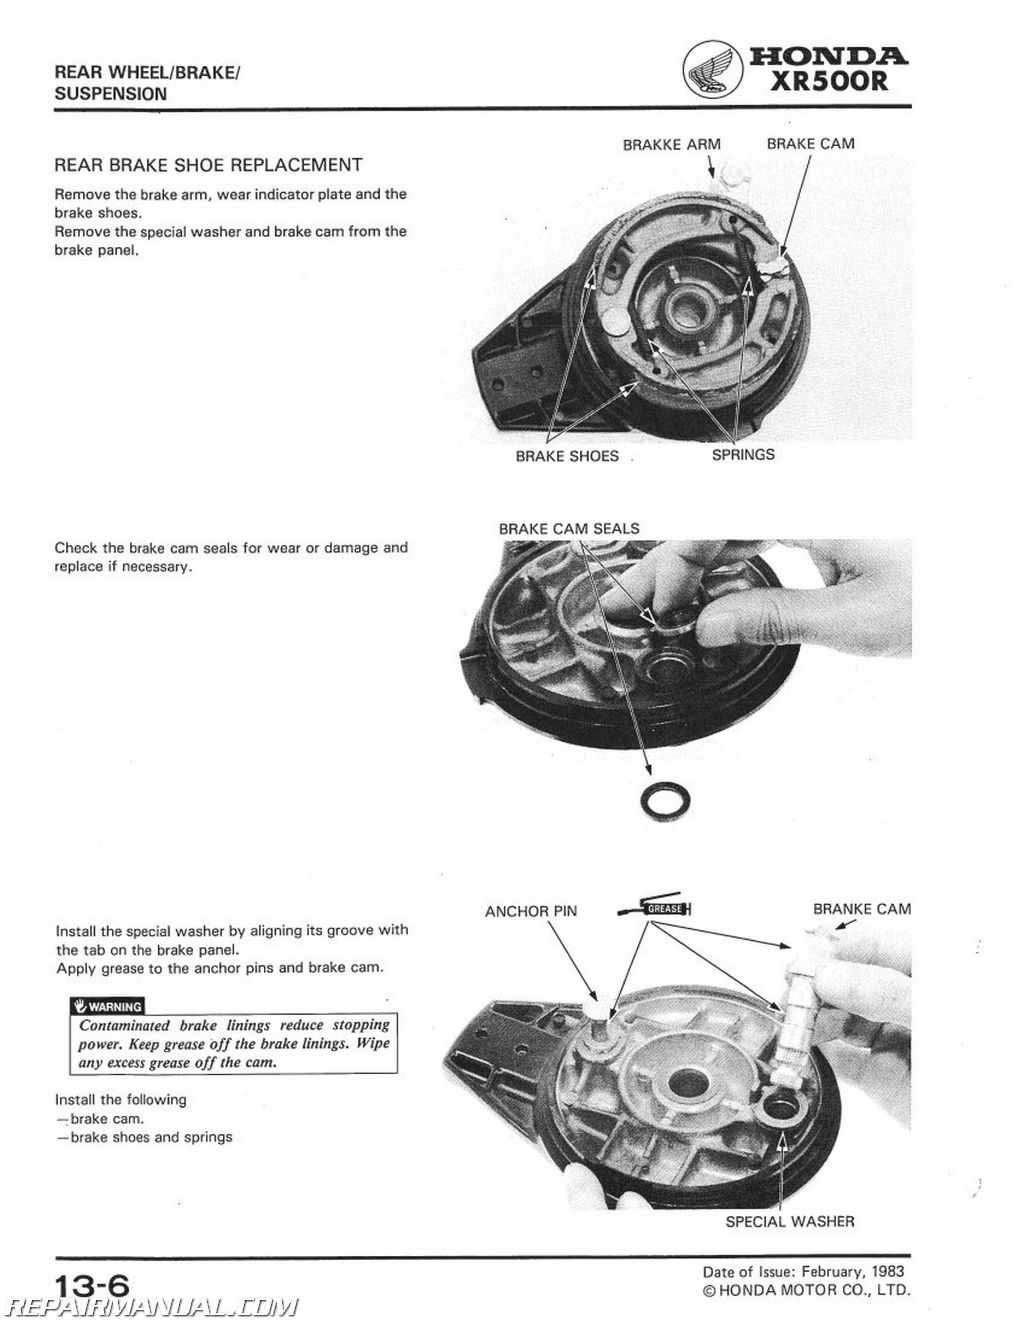 1983 1984 honda xr500r motorcycle service manual rh repairmanual com 1980 honda xr500 wiring diagram 1979 honda xr500 wiring diagram